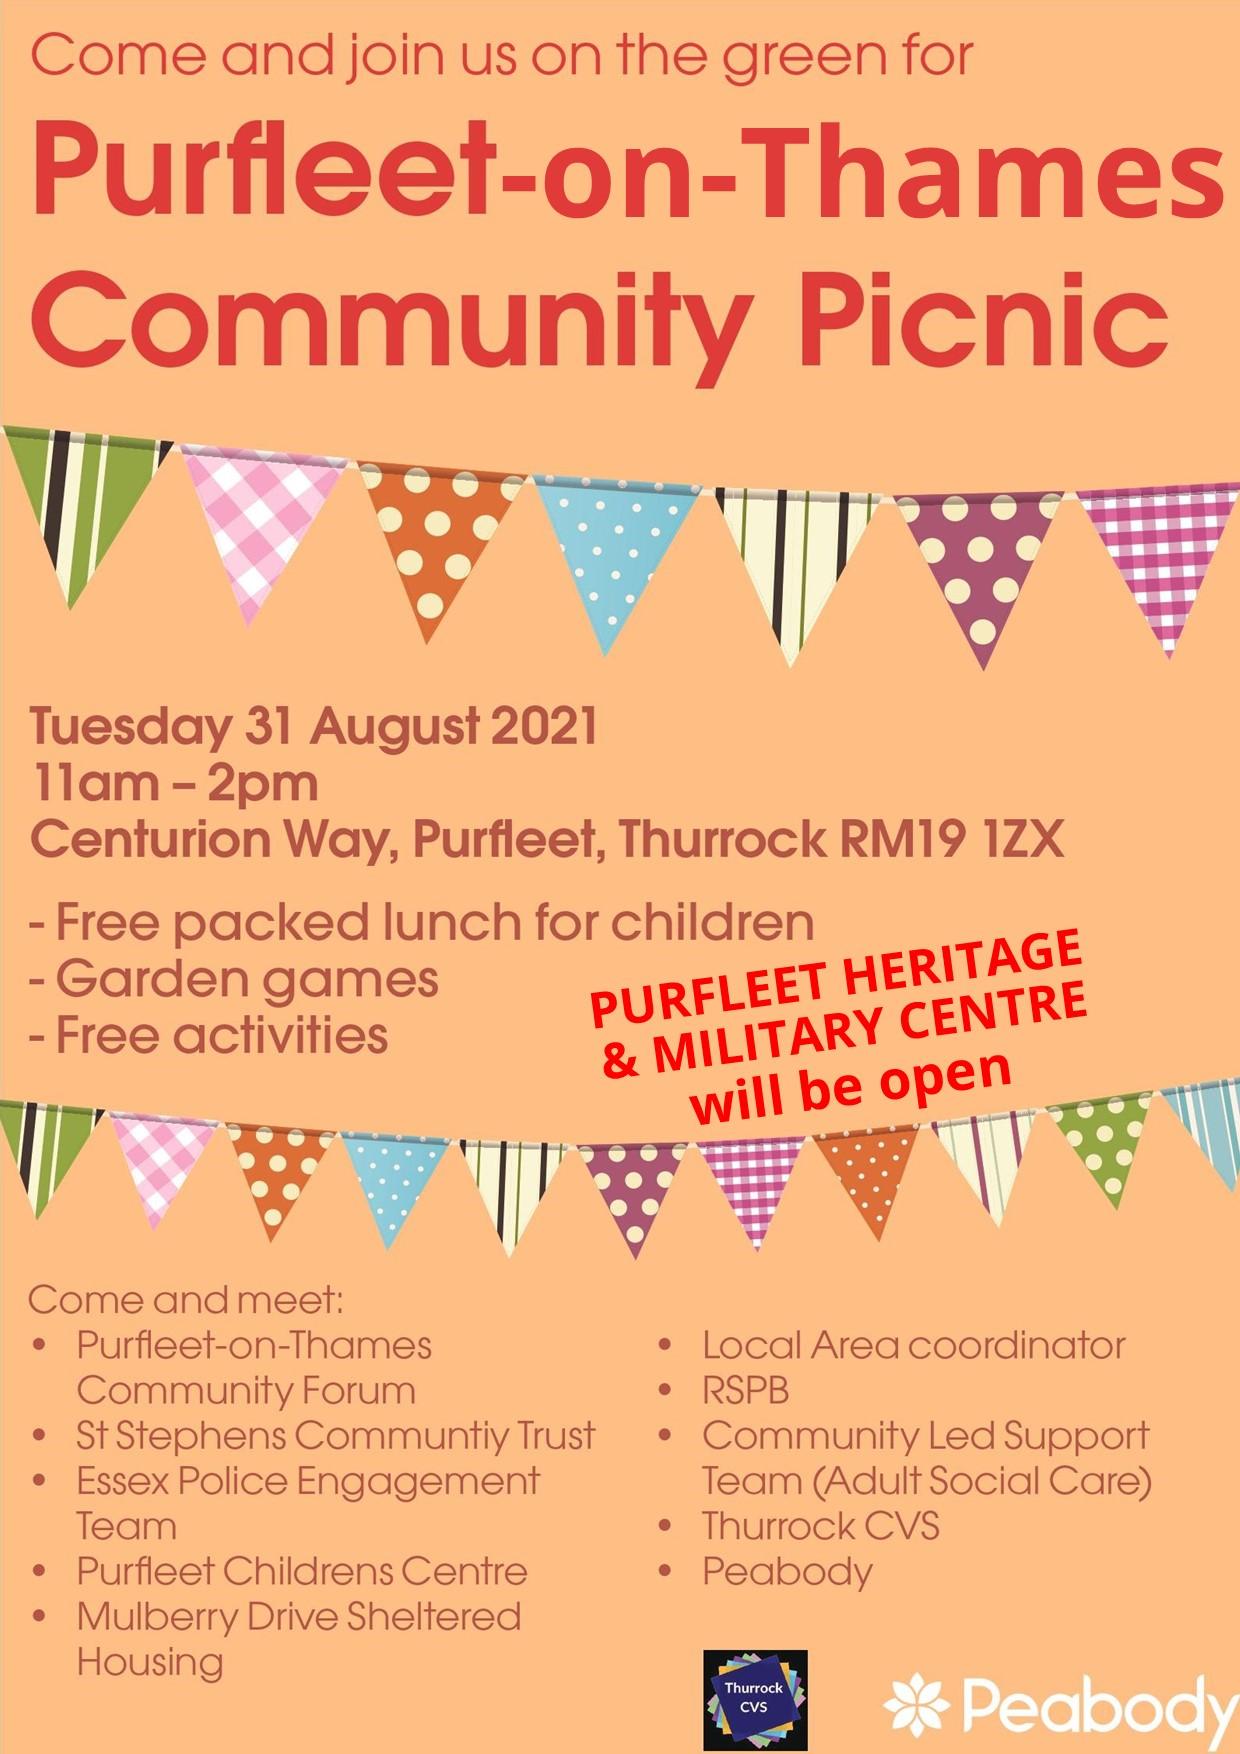 21.08.31 PoT Community Picnic